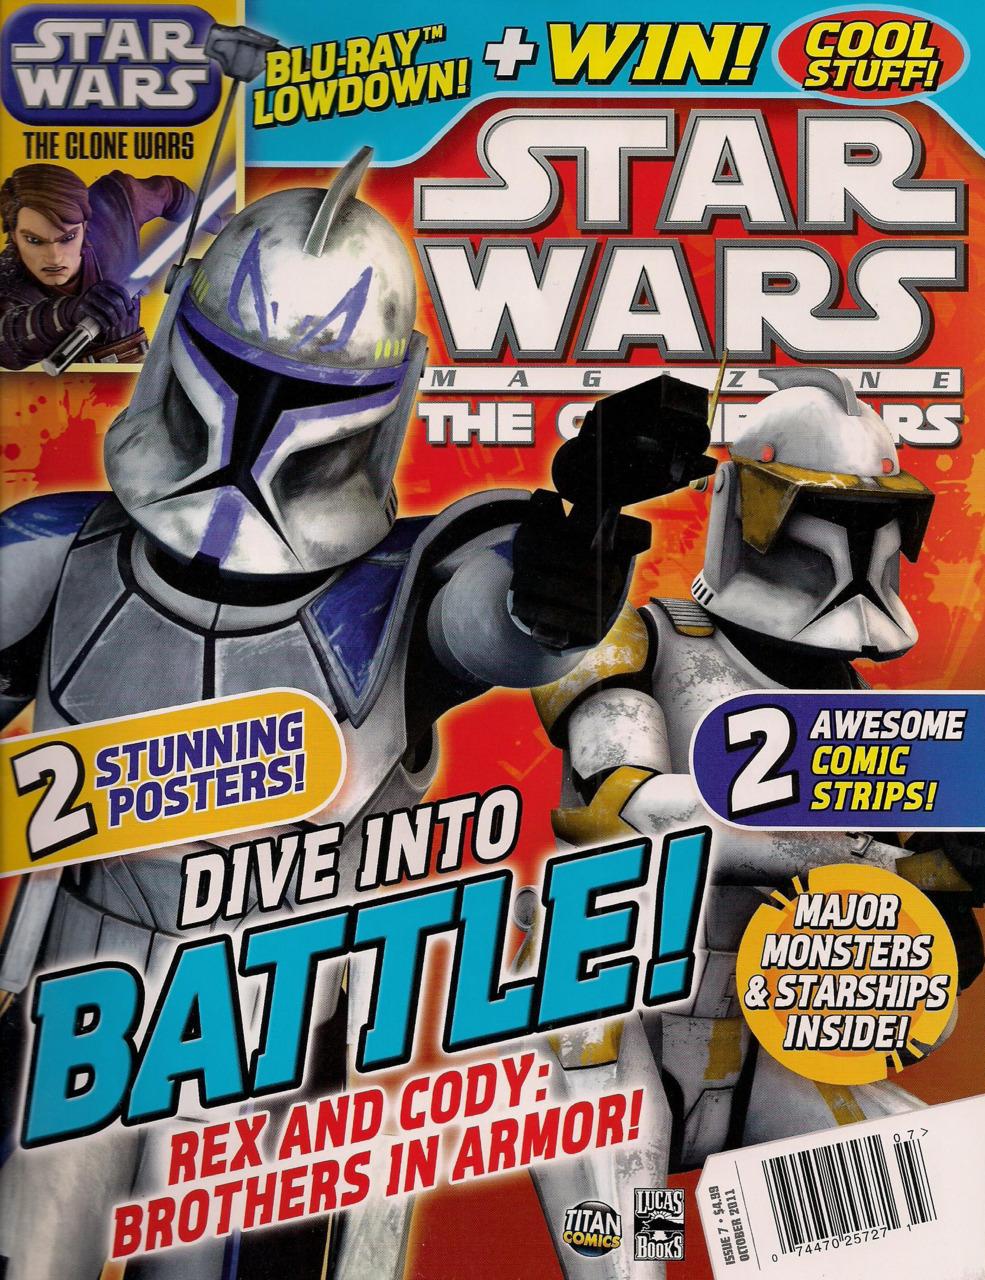 Star Wars The Clone Wars Magazine 7